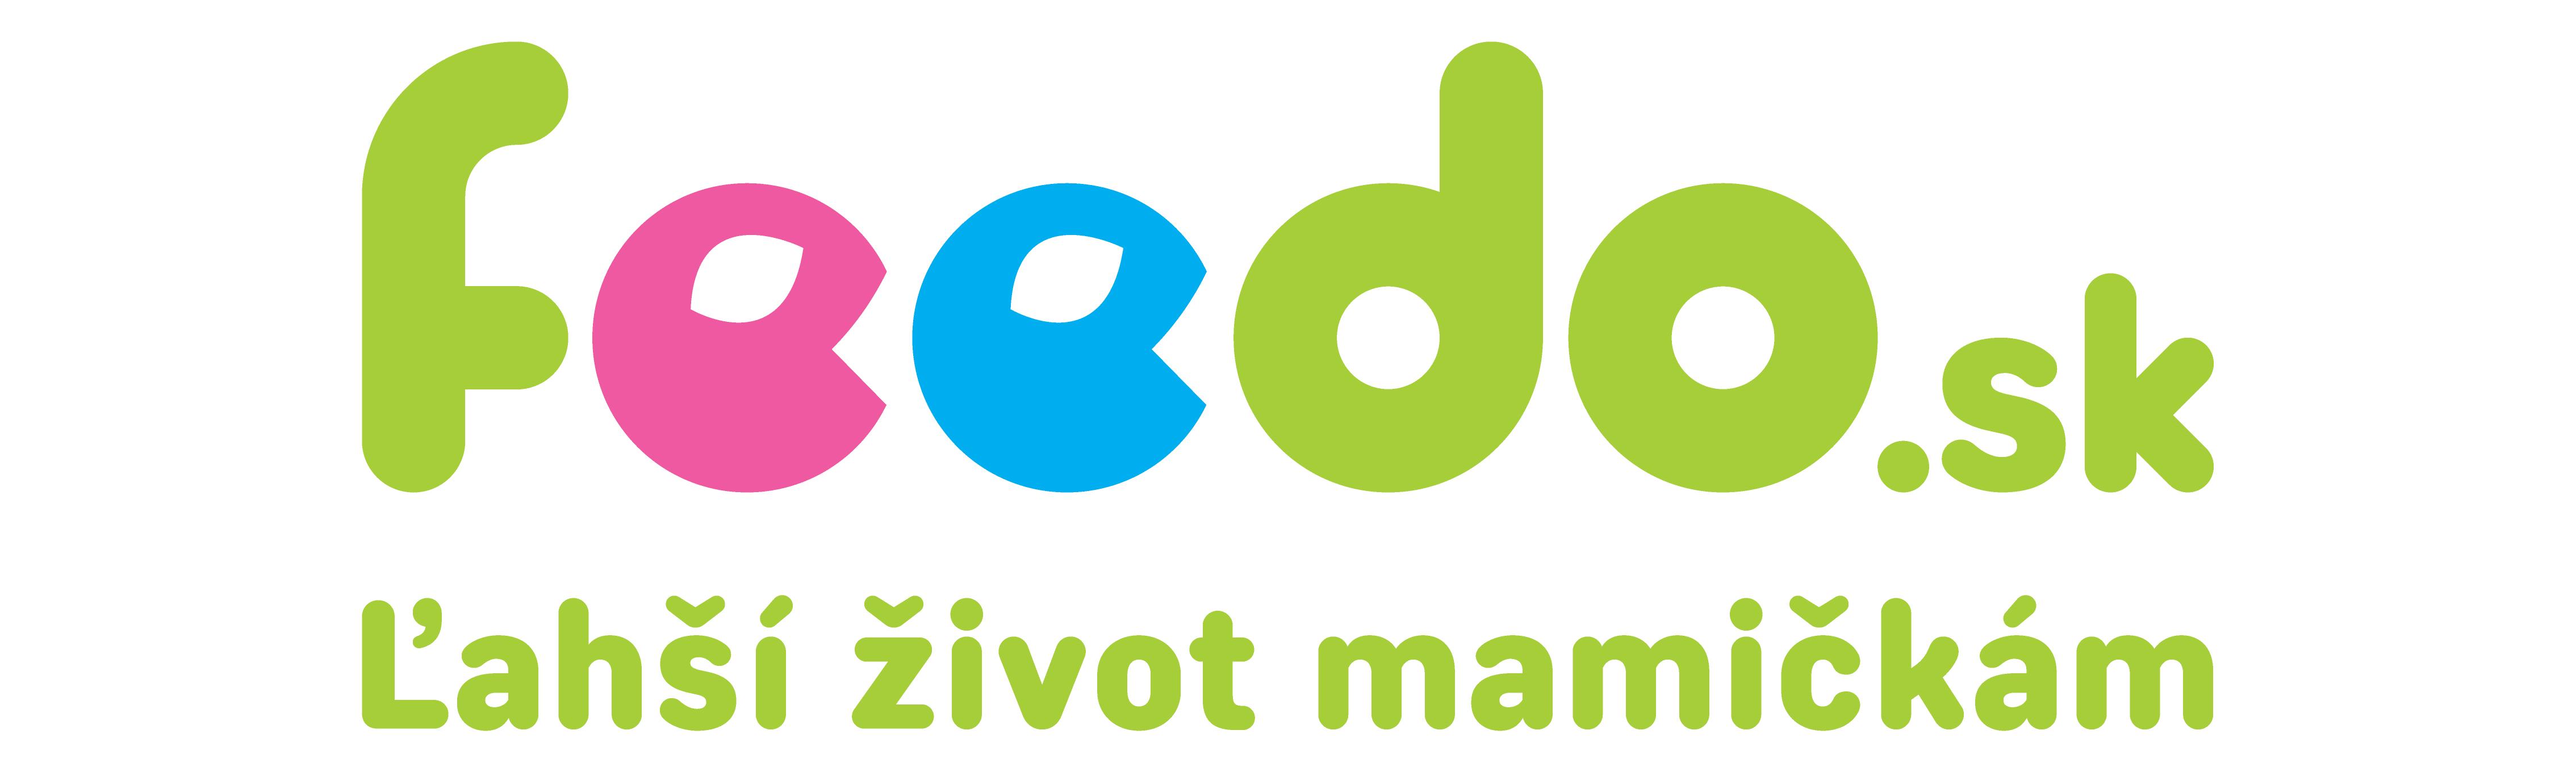 feedo-SK-slogan-CMYK